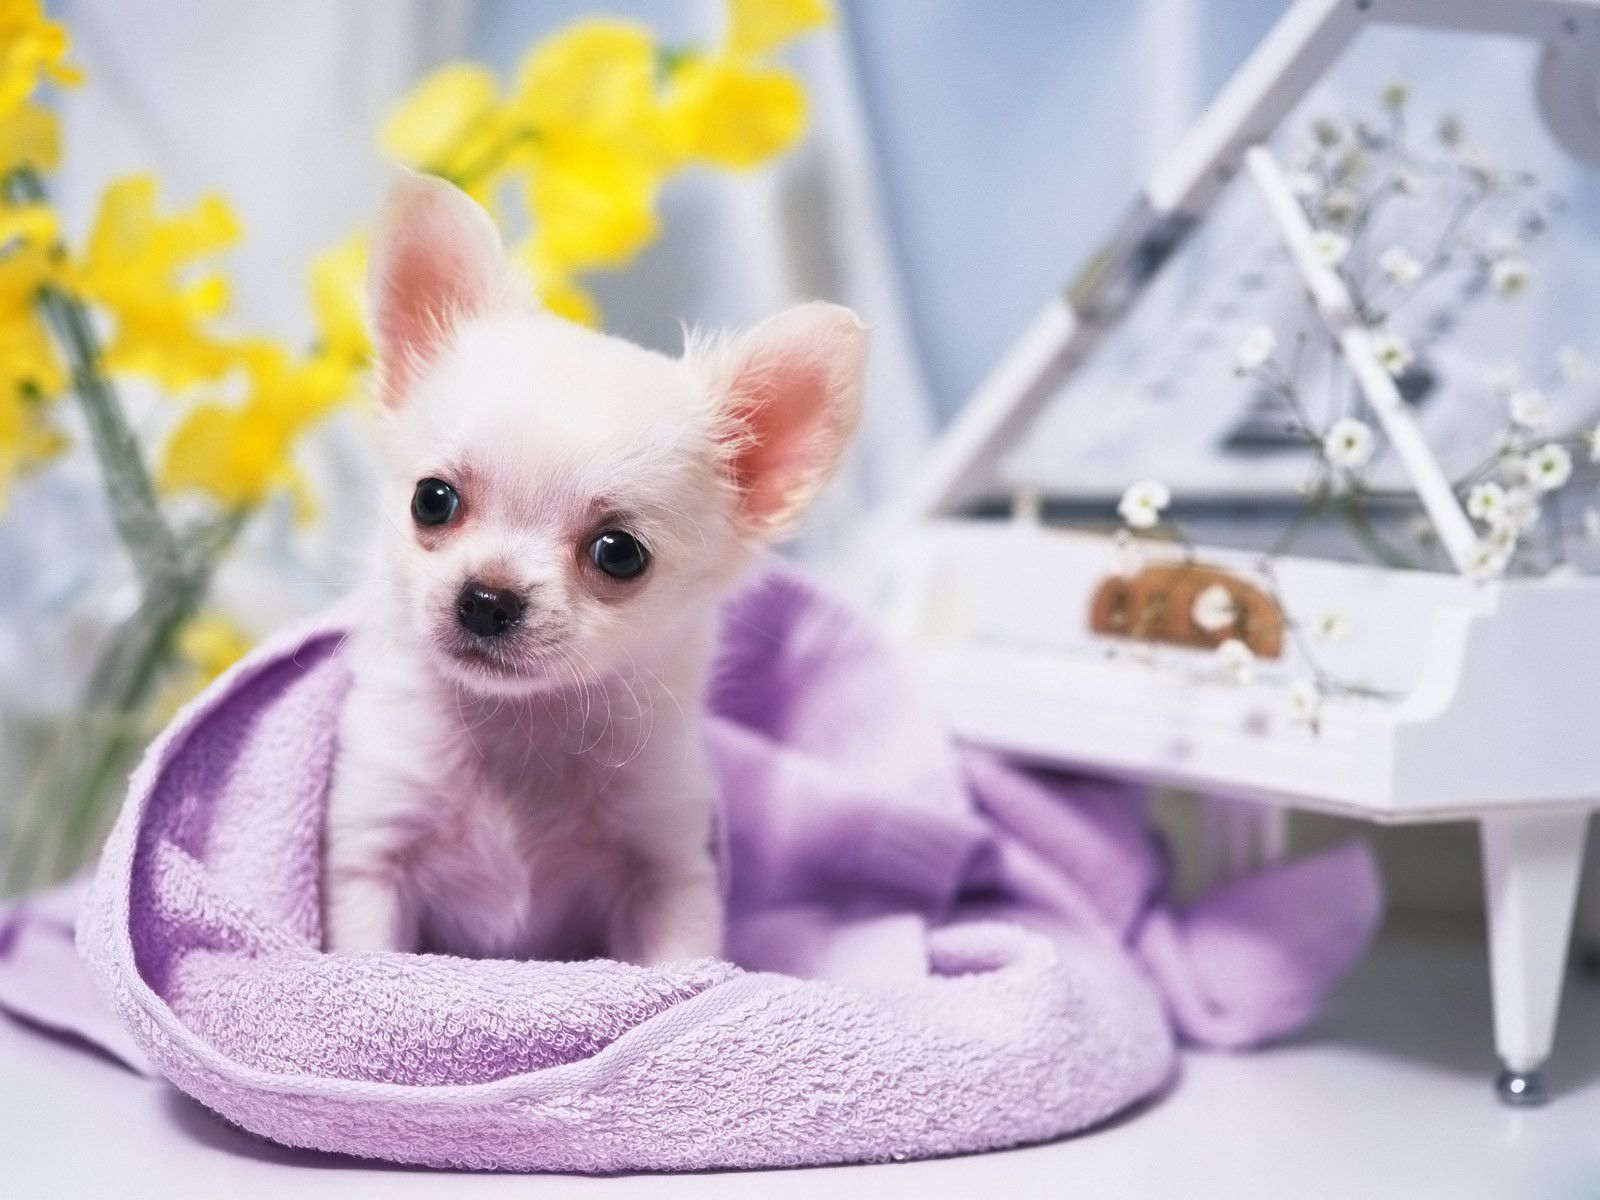 Chihuahua All Small Dogs Wallpaper 14929827 Fanpop Fanclubs Chihuahua Puppies Cute Chihuahua Cute Dog Photos